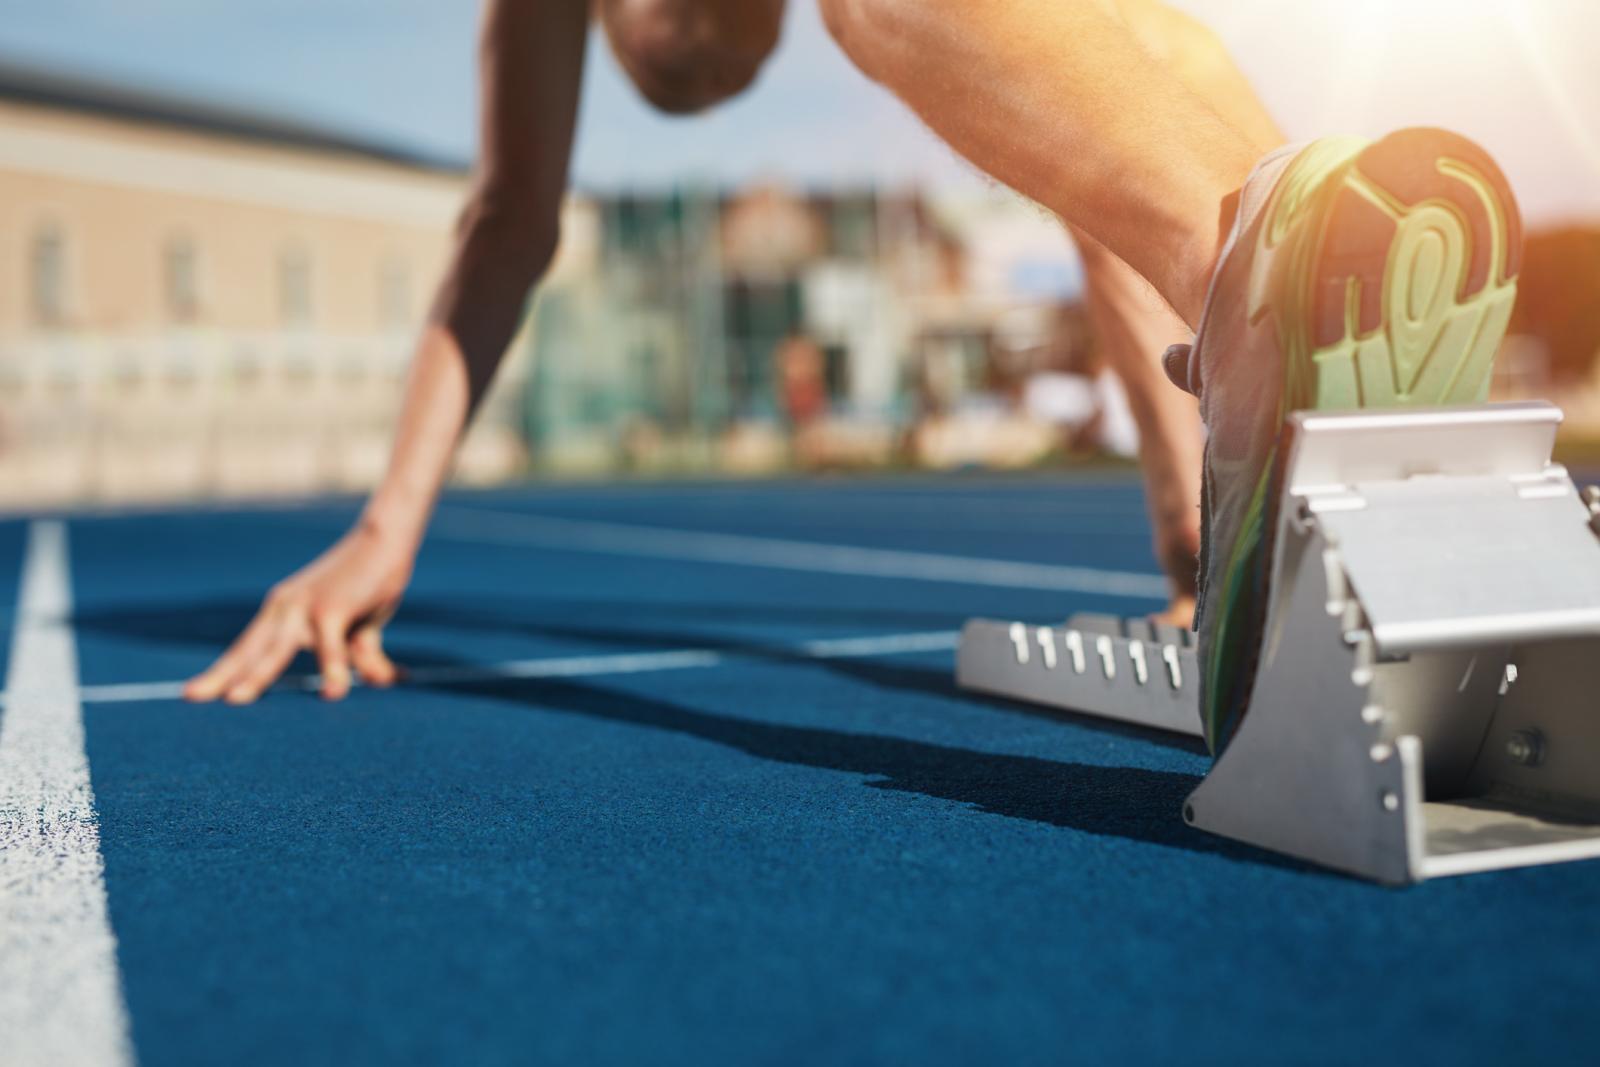 im Angebot Trennschuhe reduzierter Preis Laufschuh-Trends 2019: Der Wettkampfschuh | SPORTaktiv.com